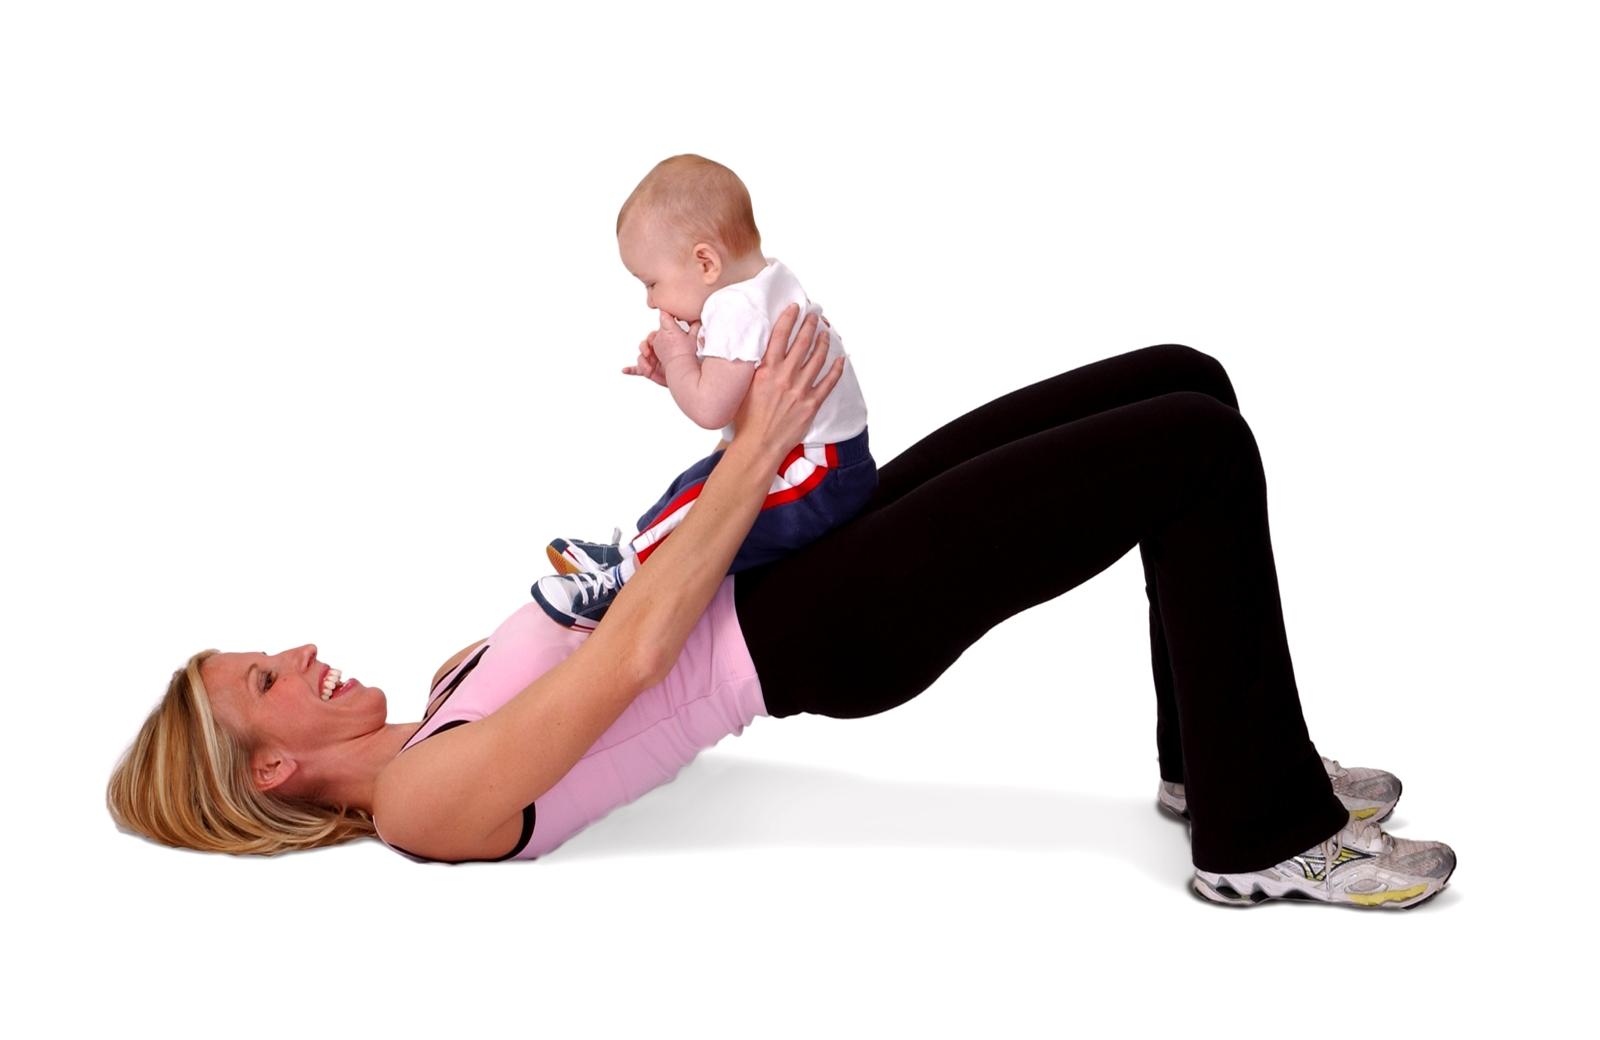 Cách giảm cân sau khi sinh con hiệu quả